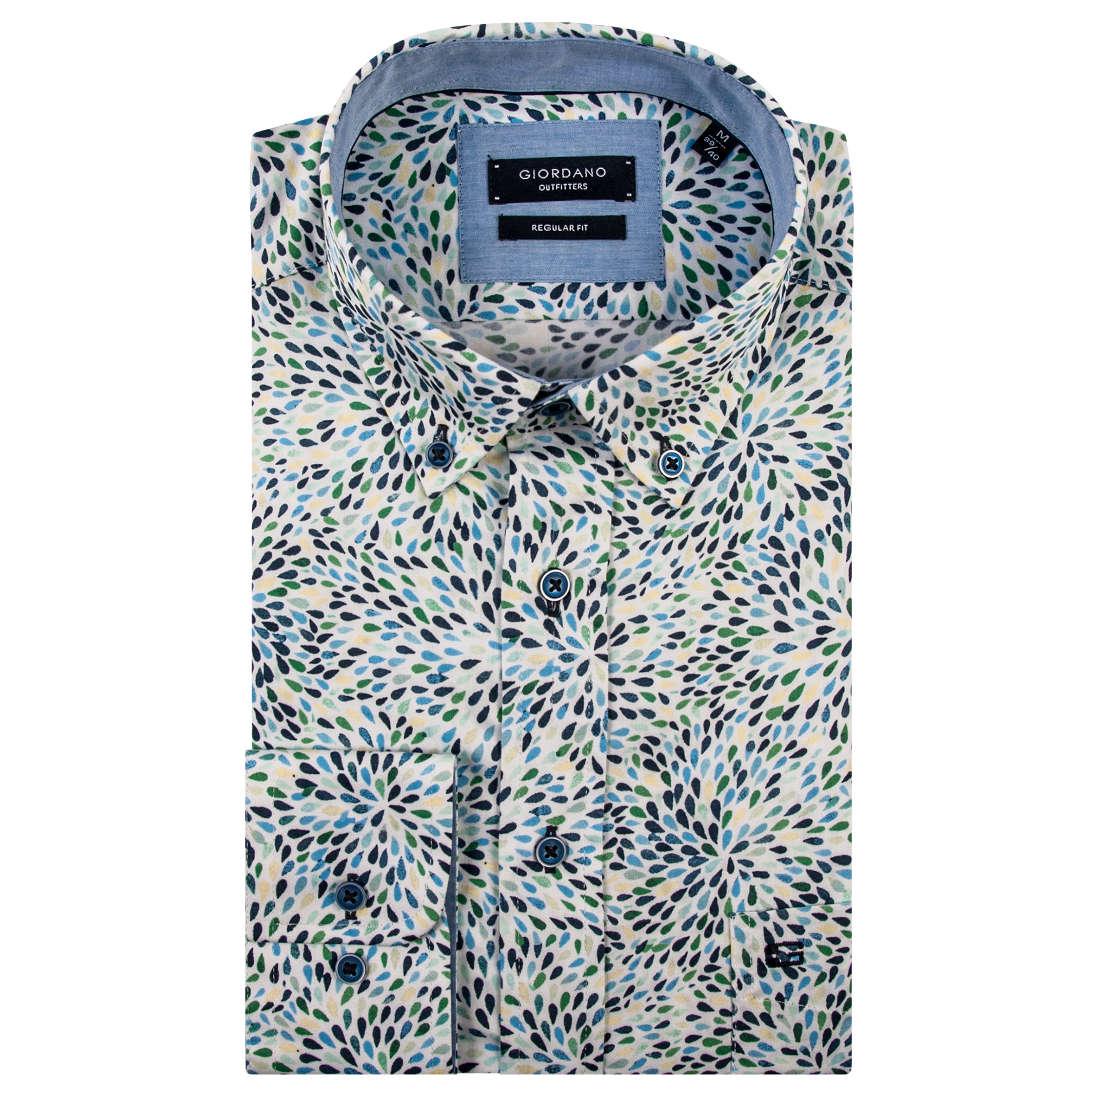 Giordano overhemd Regular Fit 91-6016 in het Groen